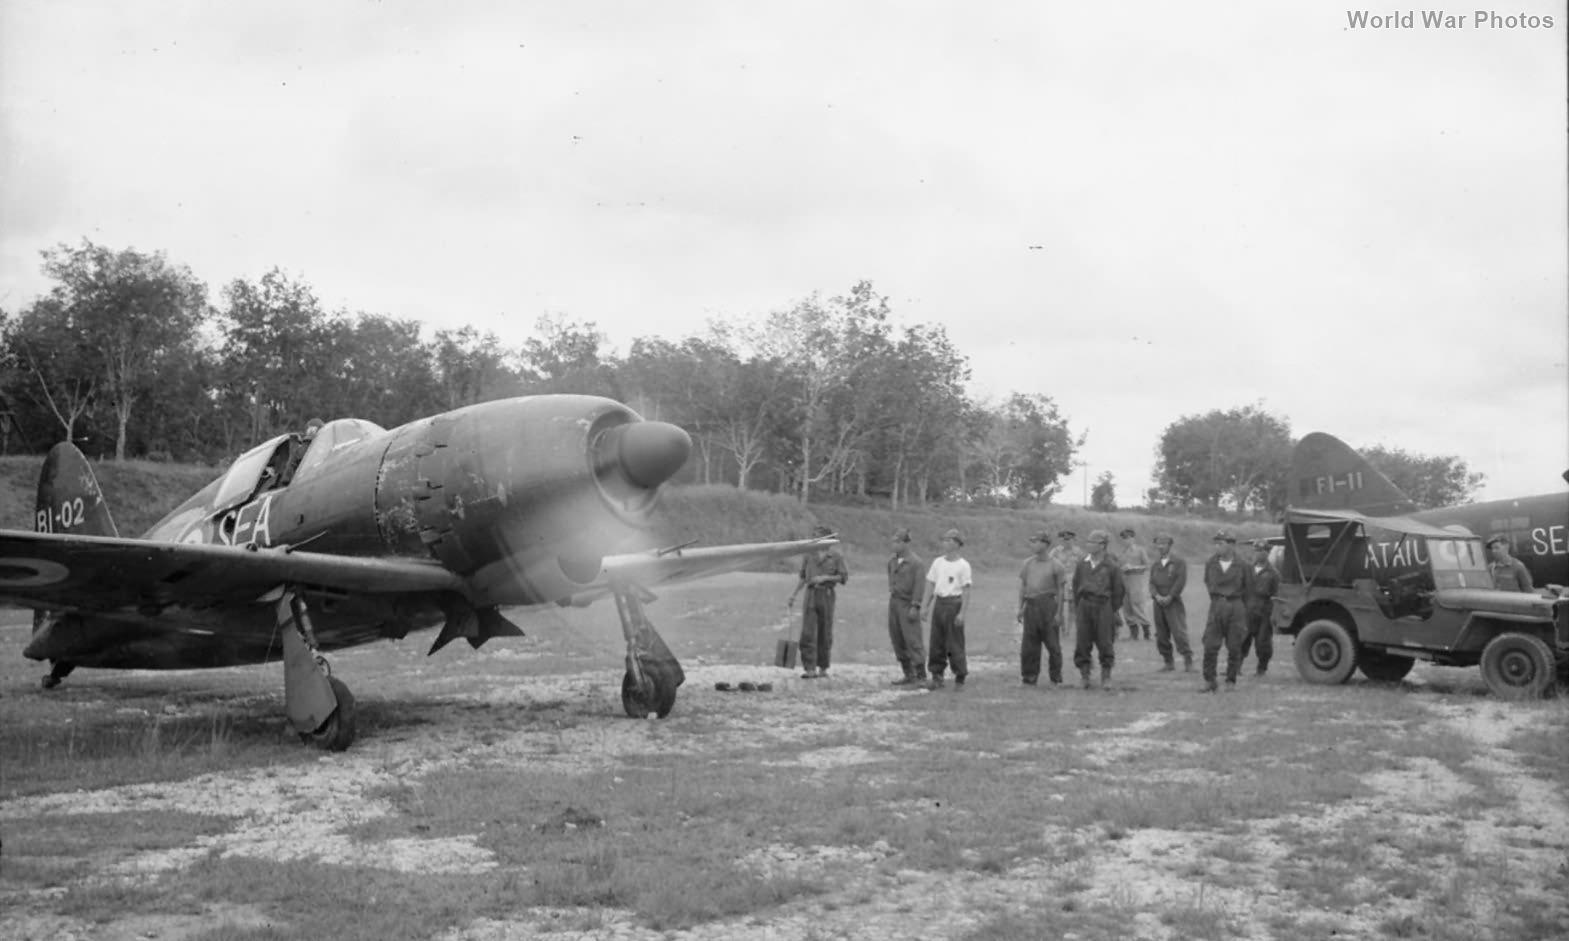 J2M3 BI-02 Malaya